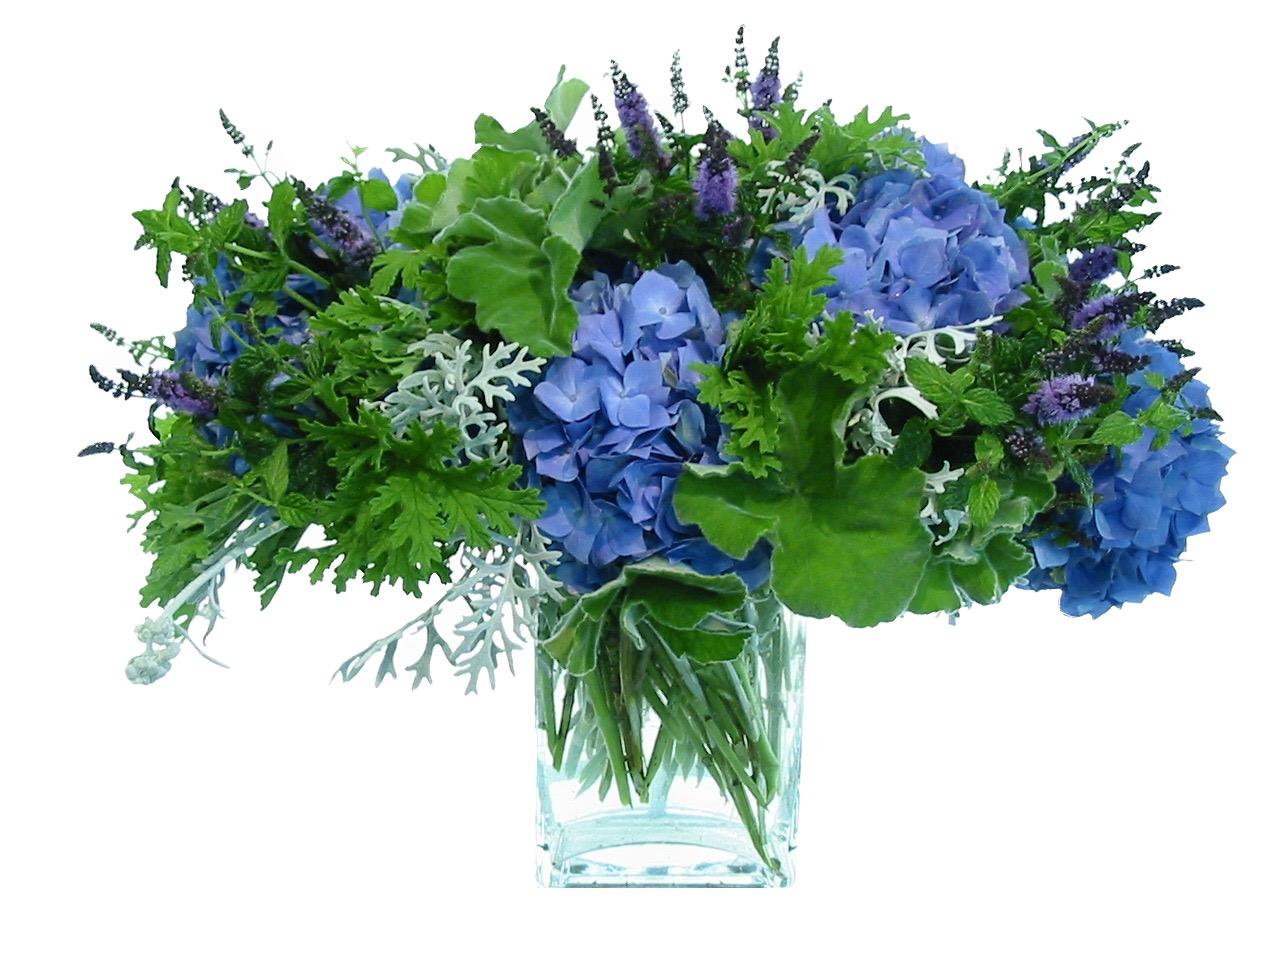 Herbal Blue Hydrangea Comp starts at $225